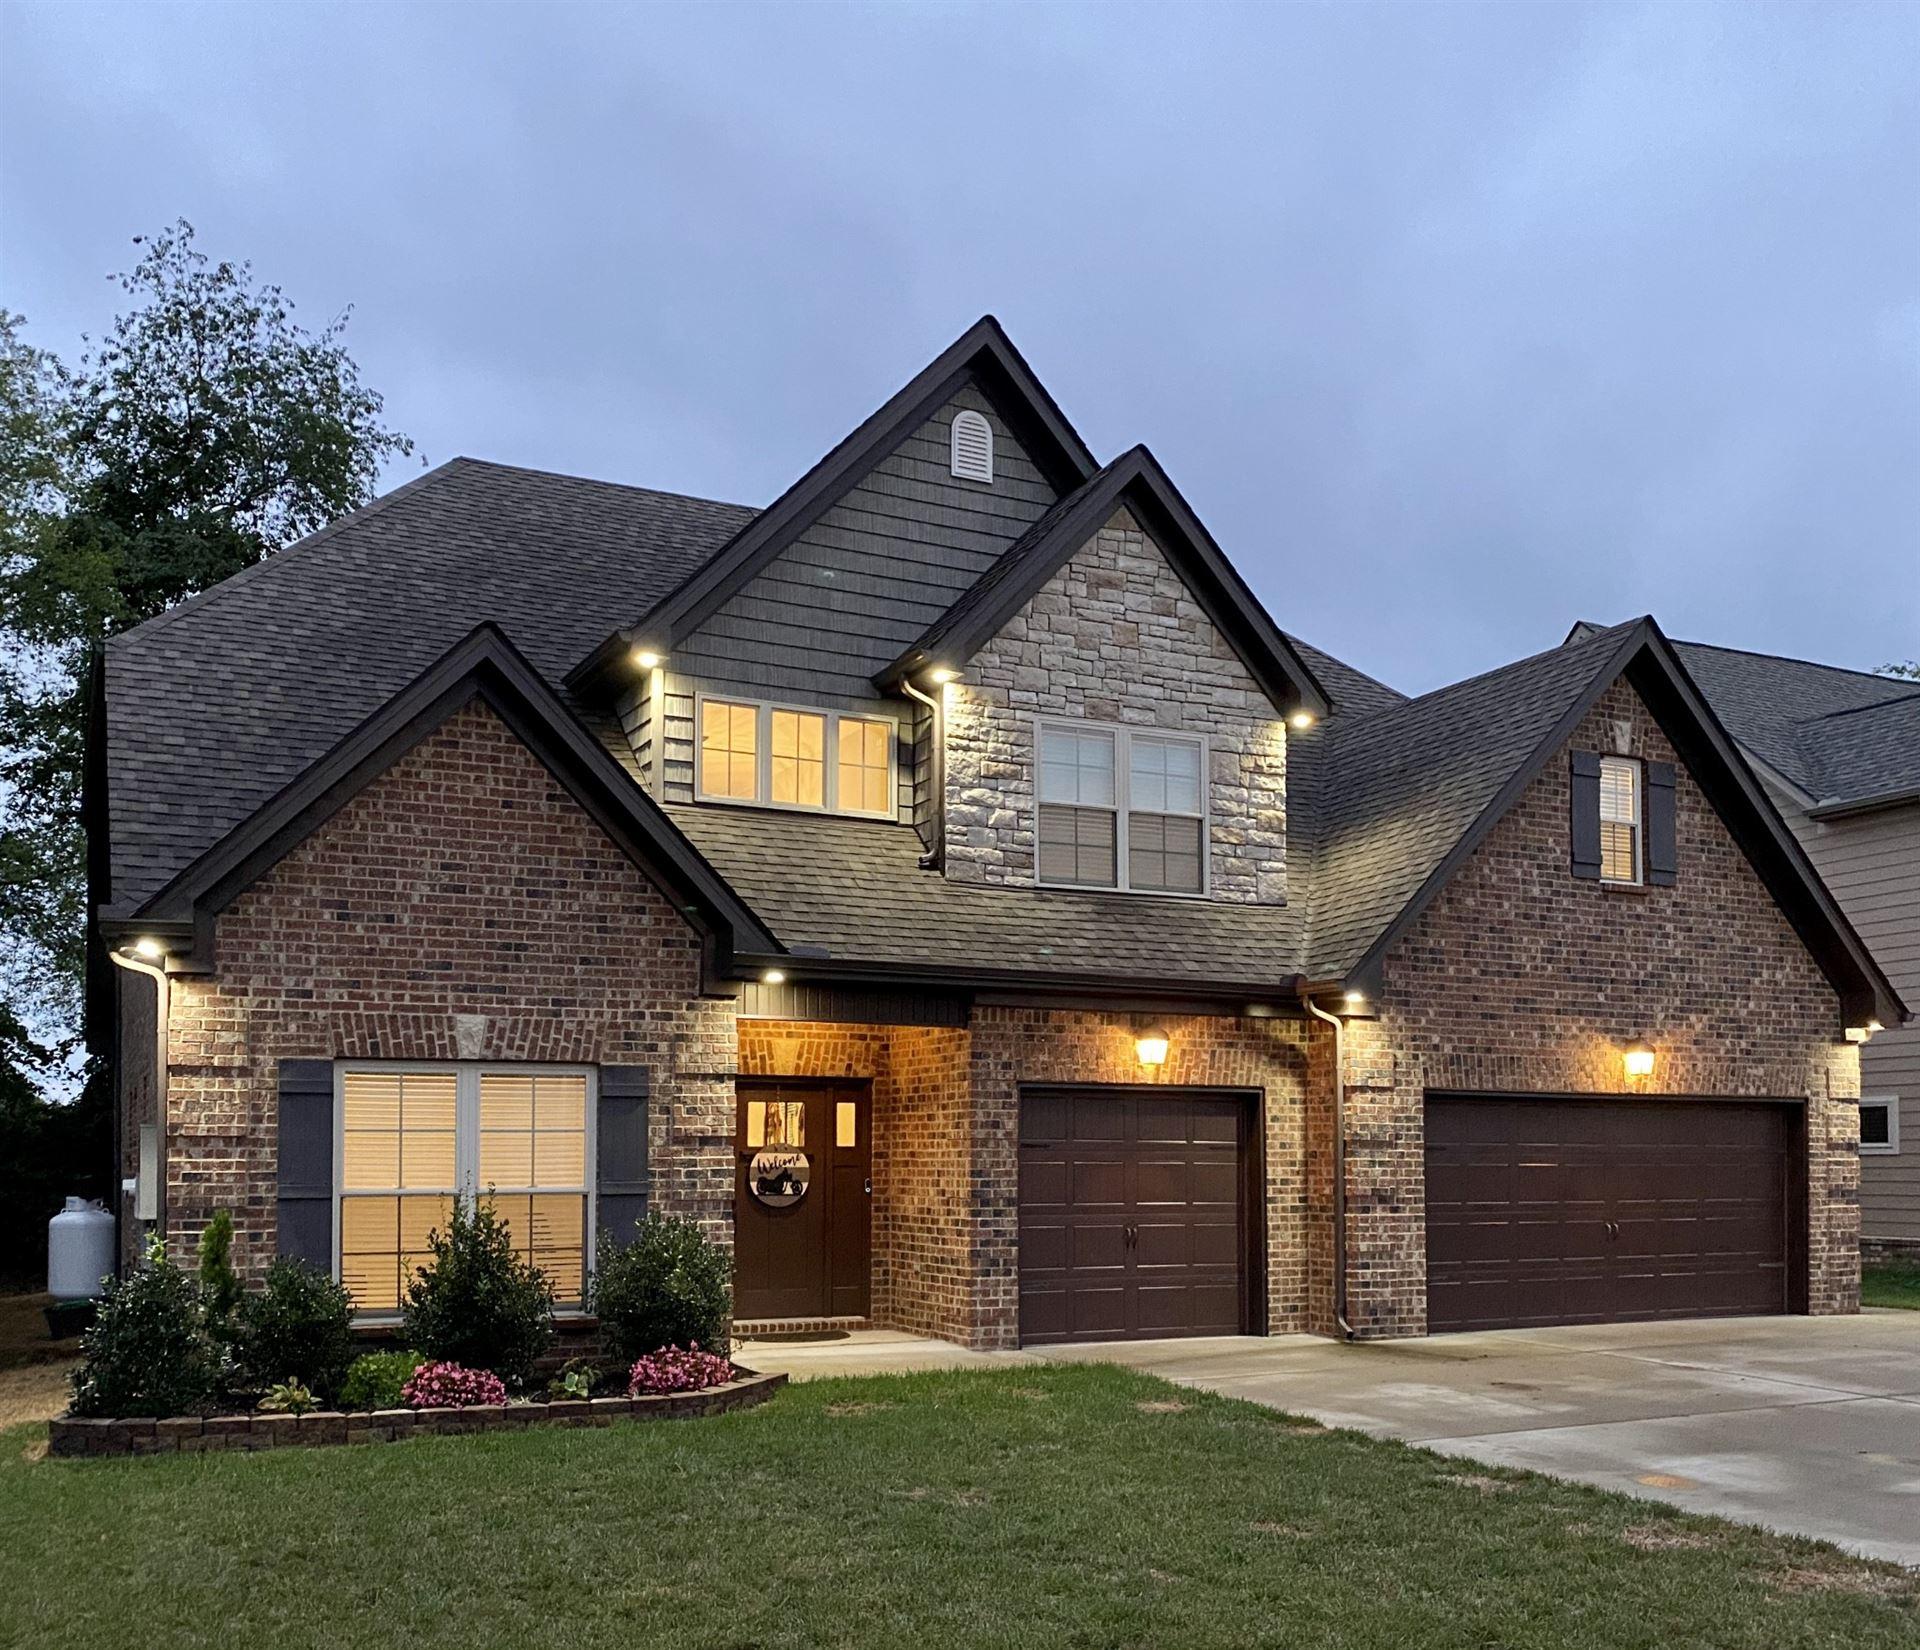 4818 Saint Ives Dr, Murfreesboro, TN 37128 - MLS#: 2189006